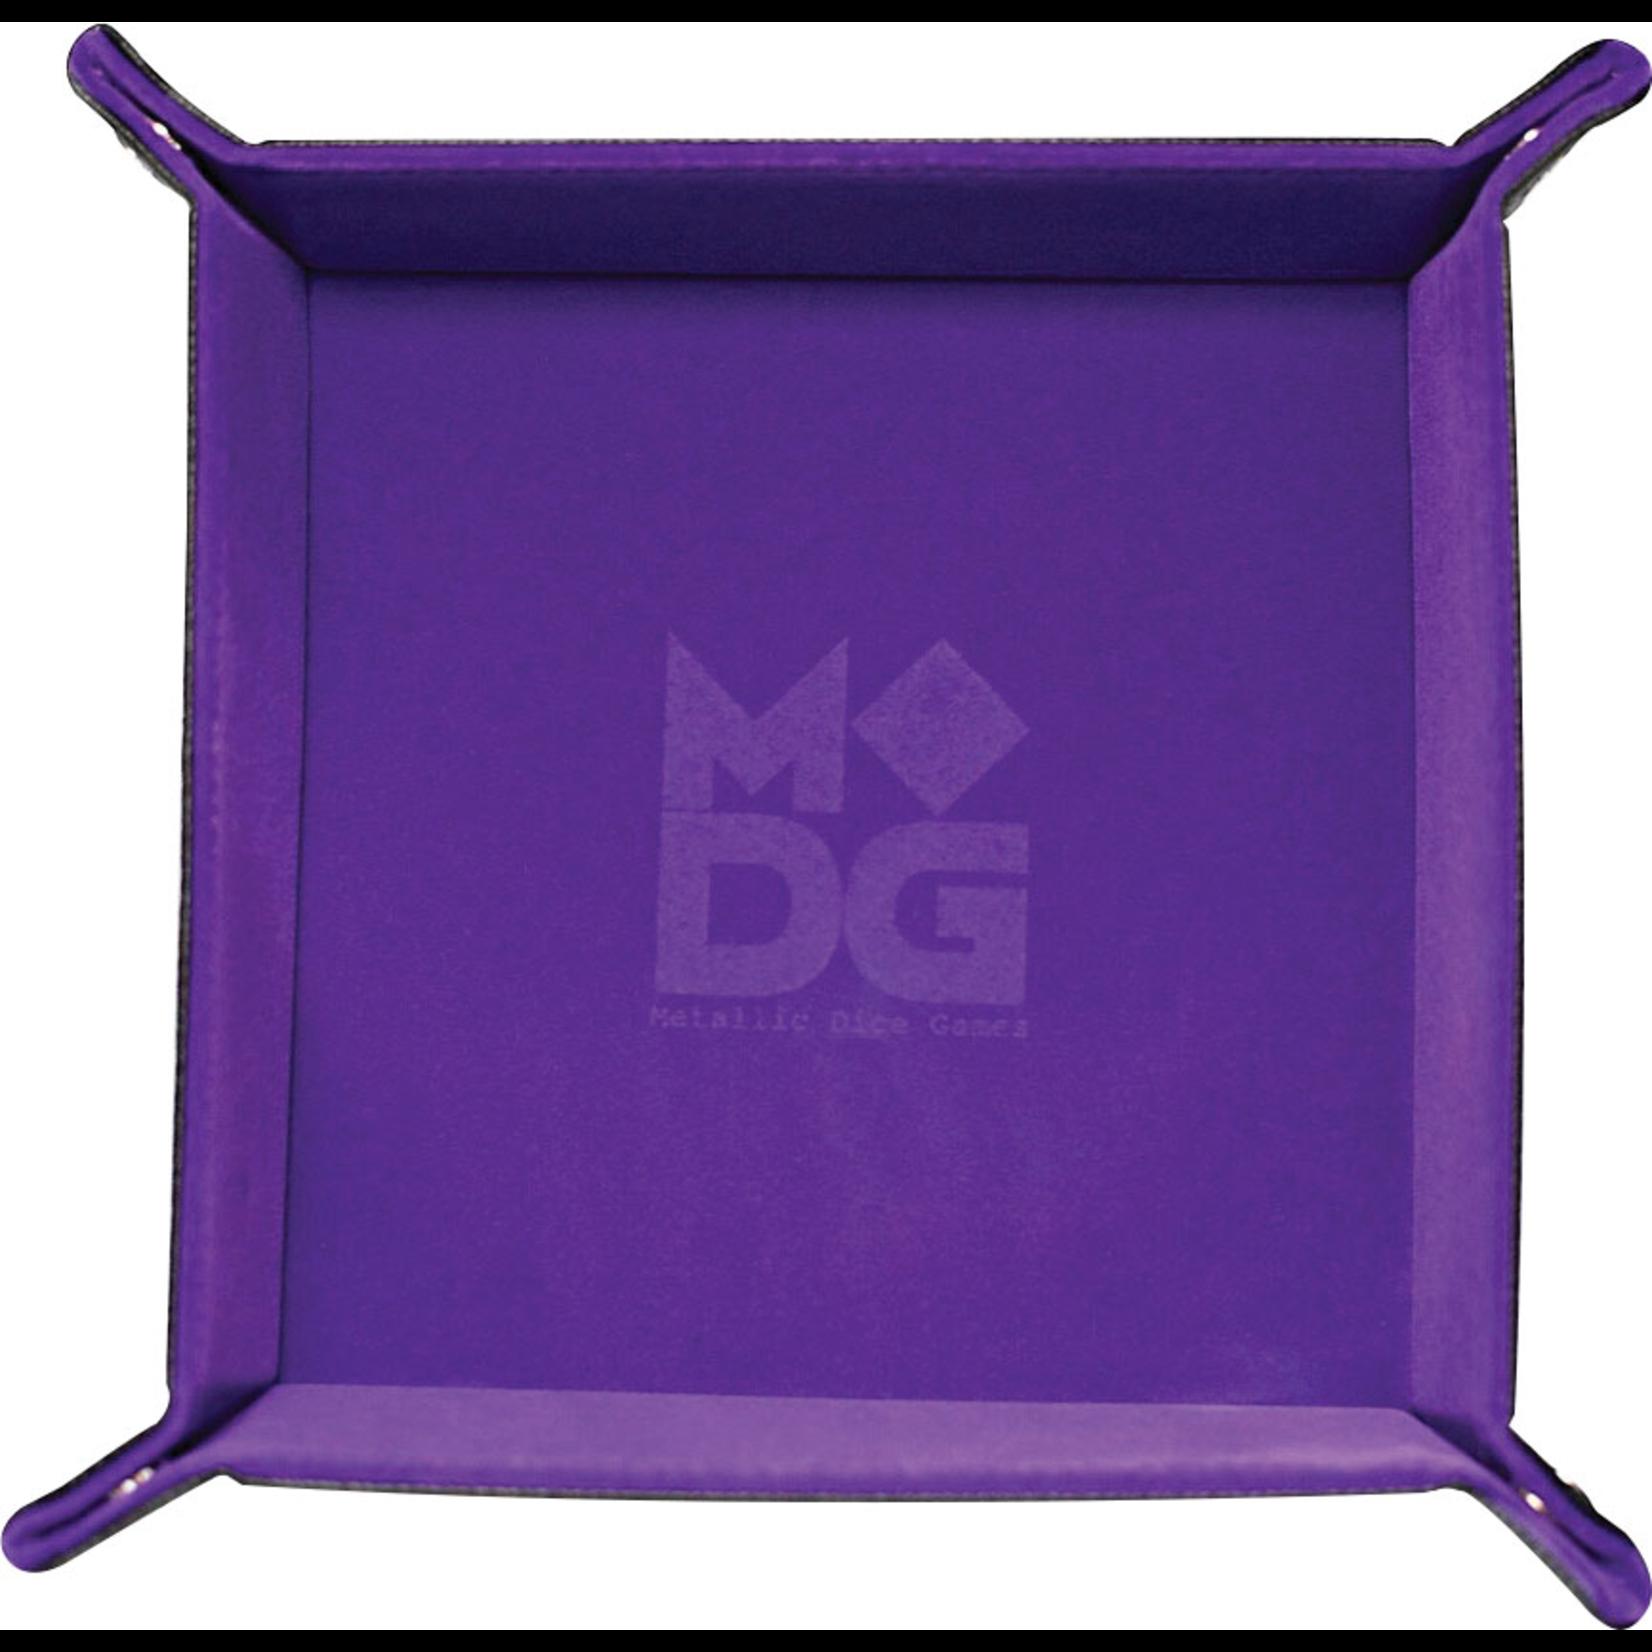 "Metallic Dice Games Velvet Folding Dice Tray 10"" x 10"" Purple"